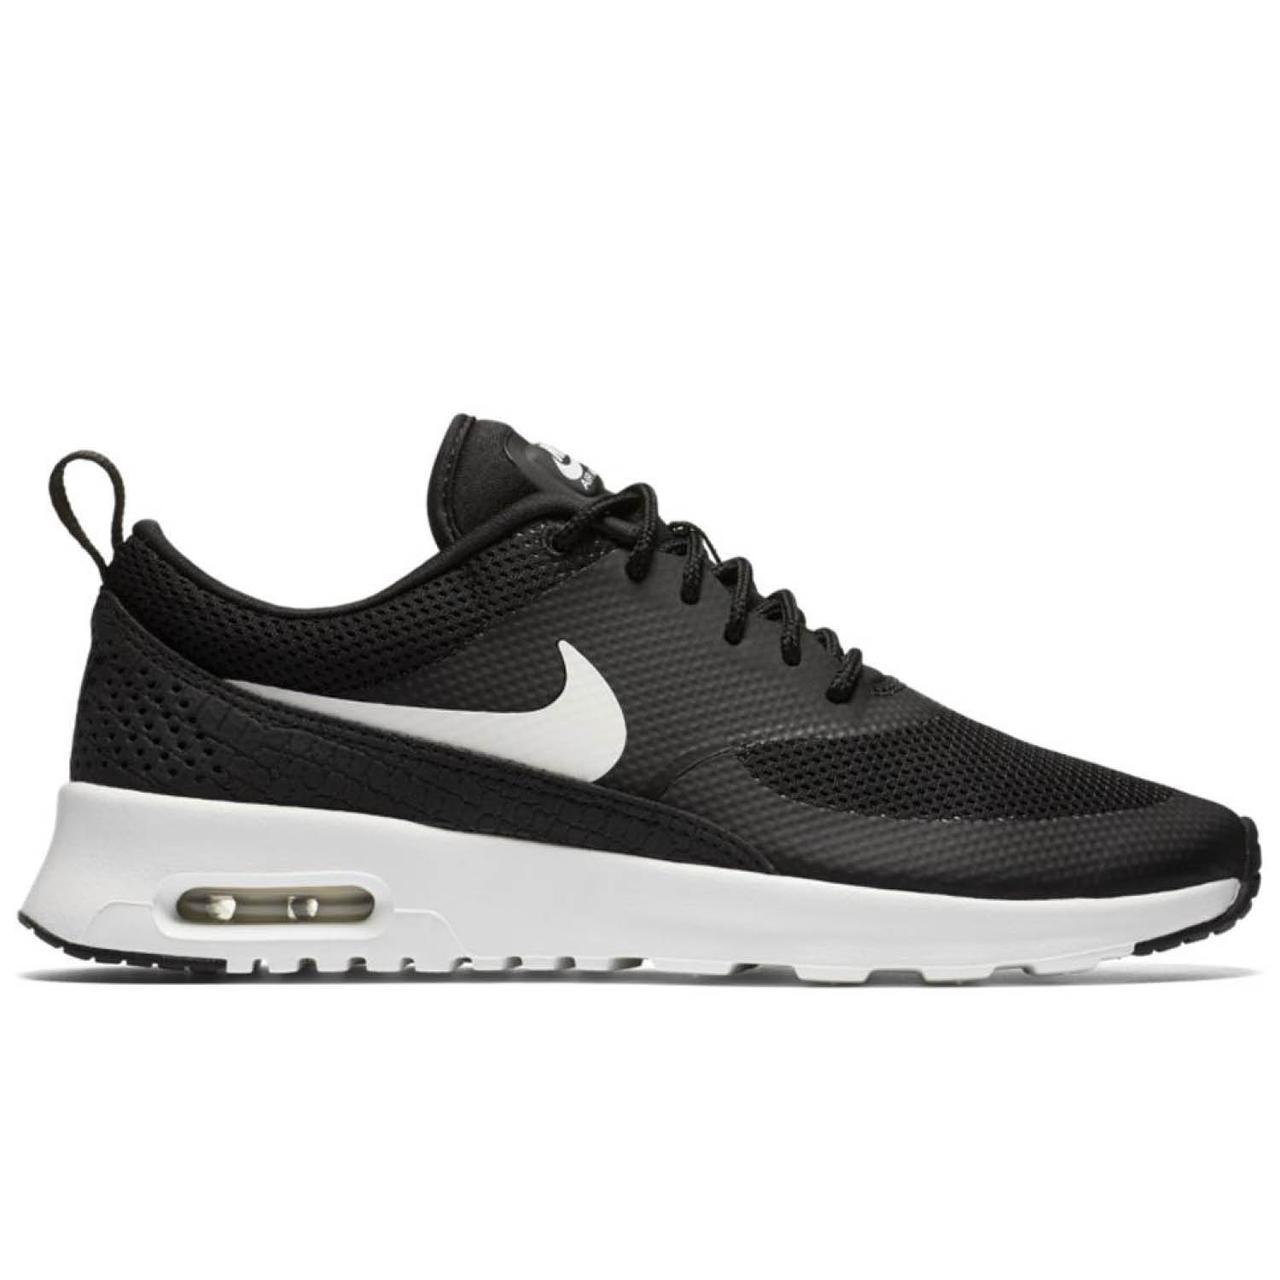 0ac215bb Оригинальные кроссовки Nike WMNS Air Max Thea , цена 2 599 грн., купить в  Ивано-Франковске — Prom.ua (ID#629769676)